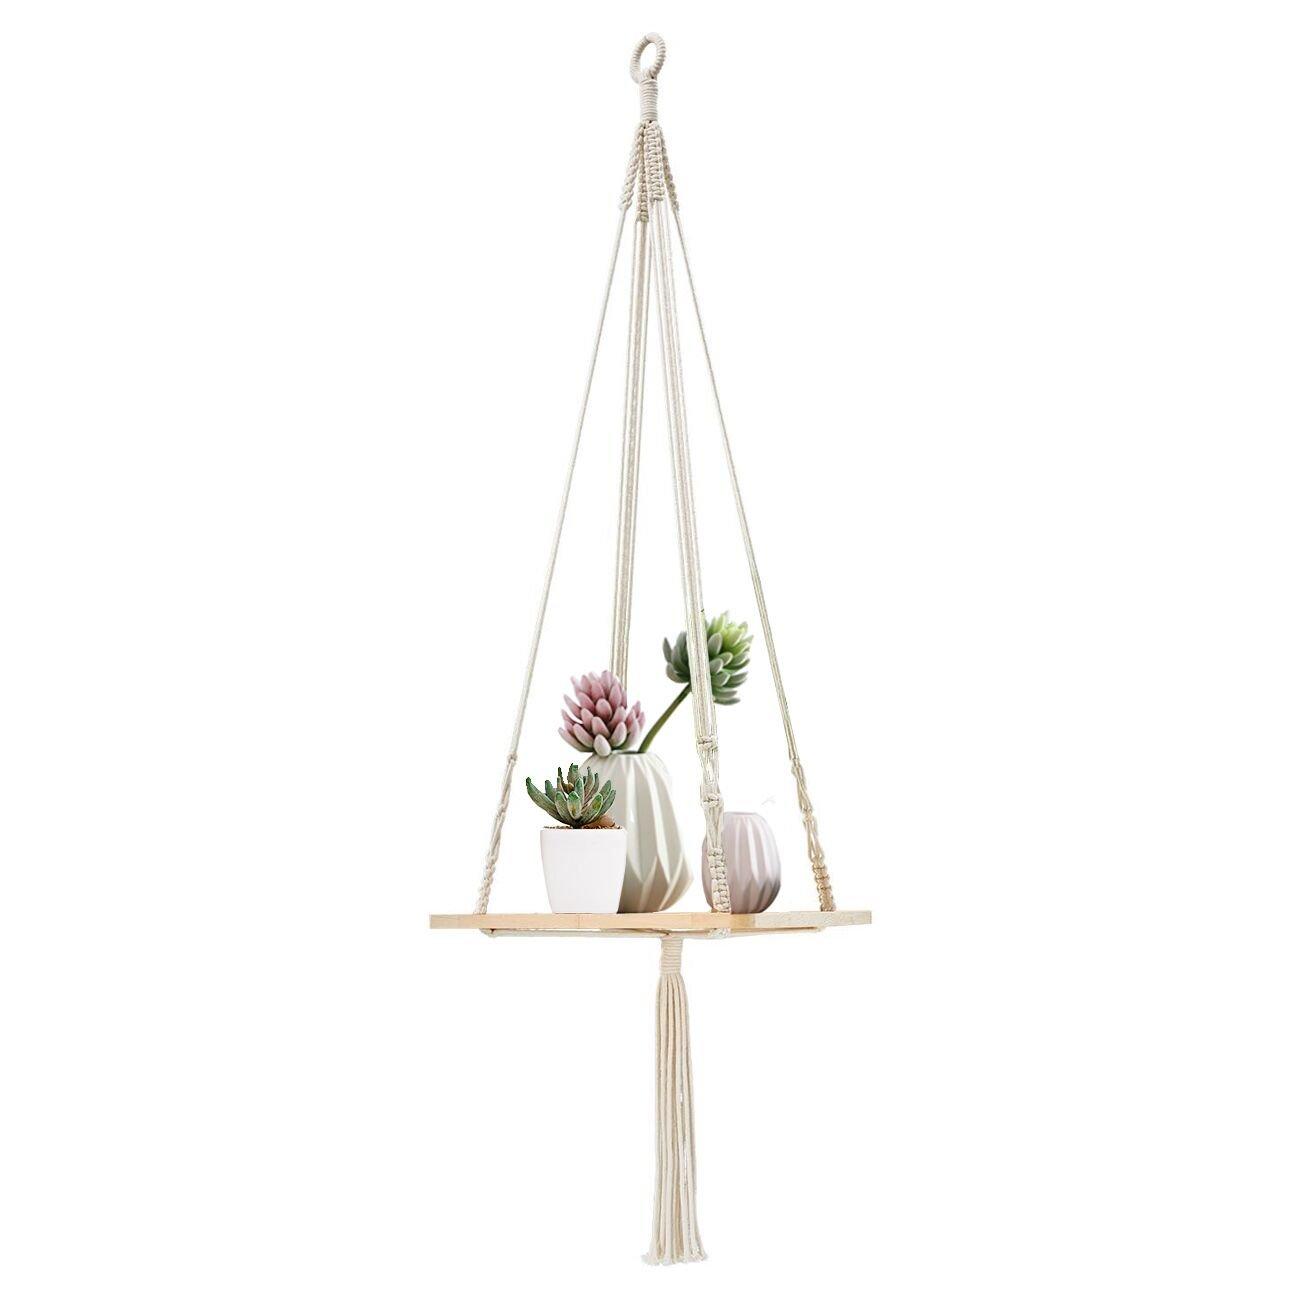 Macrame Shelf Hanging - Indoor Outdoor Garden Plant Hanger Pot Holder with Tassel Home Decor Cotton Rope Wall Art Hand Made